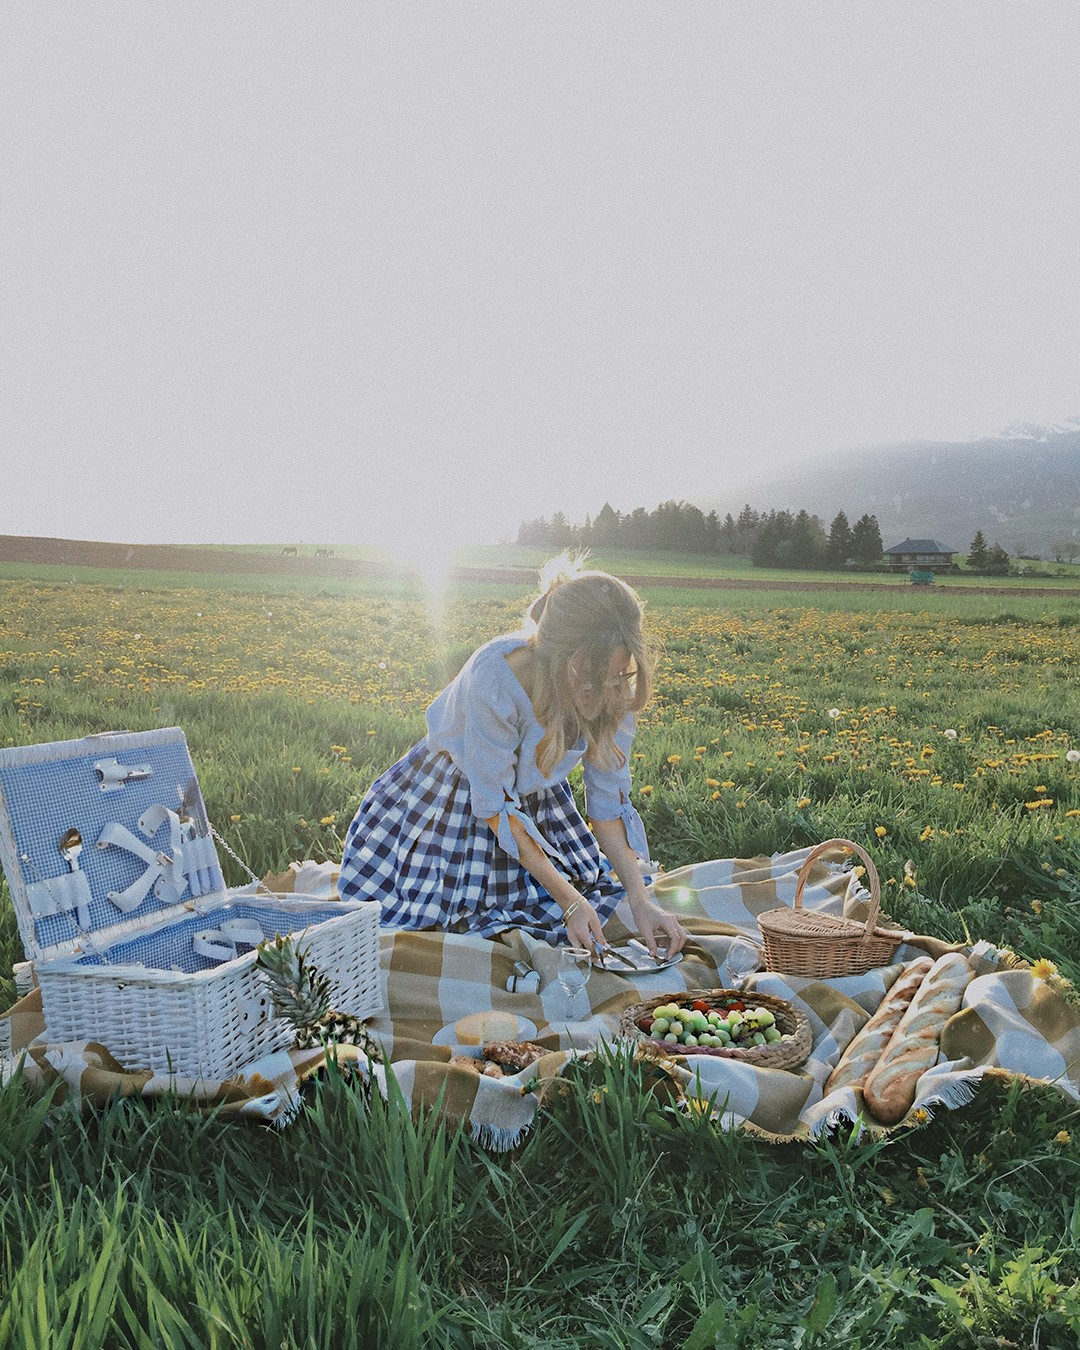 picnic-fashion-blogger-style-2017